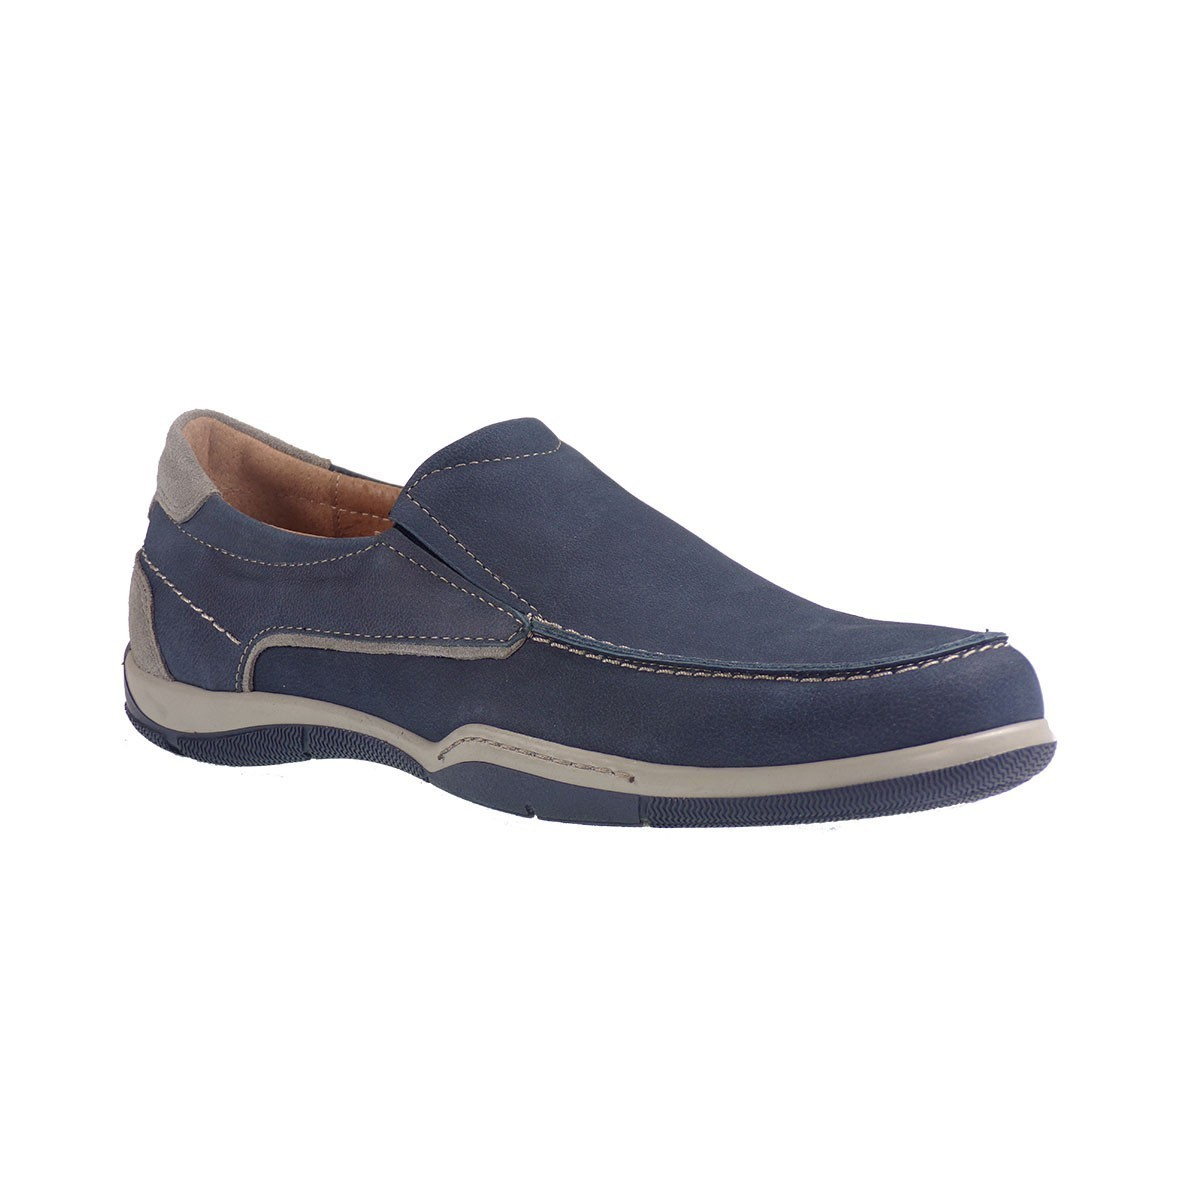 87a1c7ee173 Softies Ανδρικά Παπούτσια 6903 Μπλέ Δέρμα  Γυναικεία & Ανδρικά ...